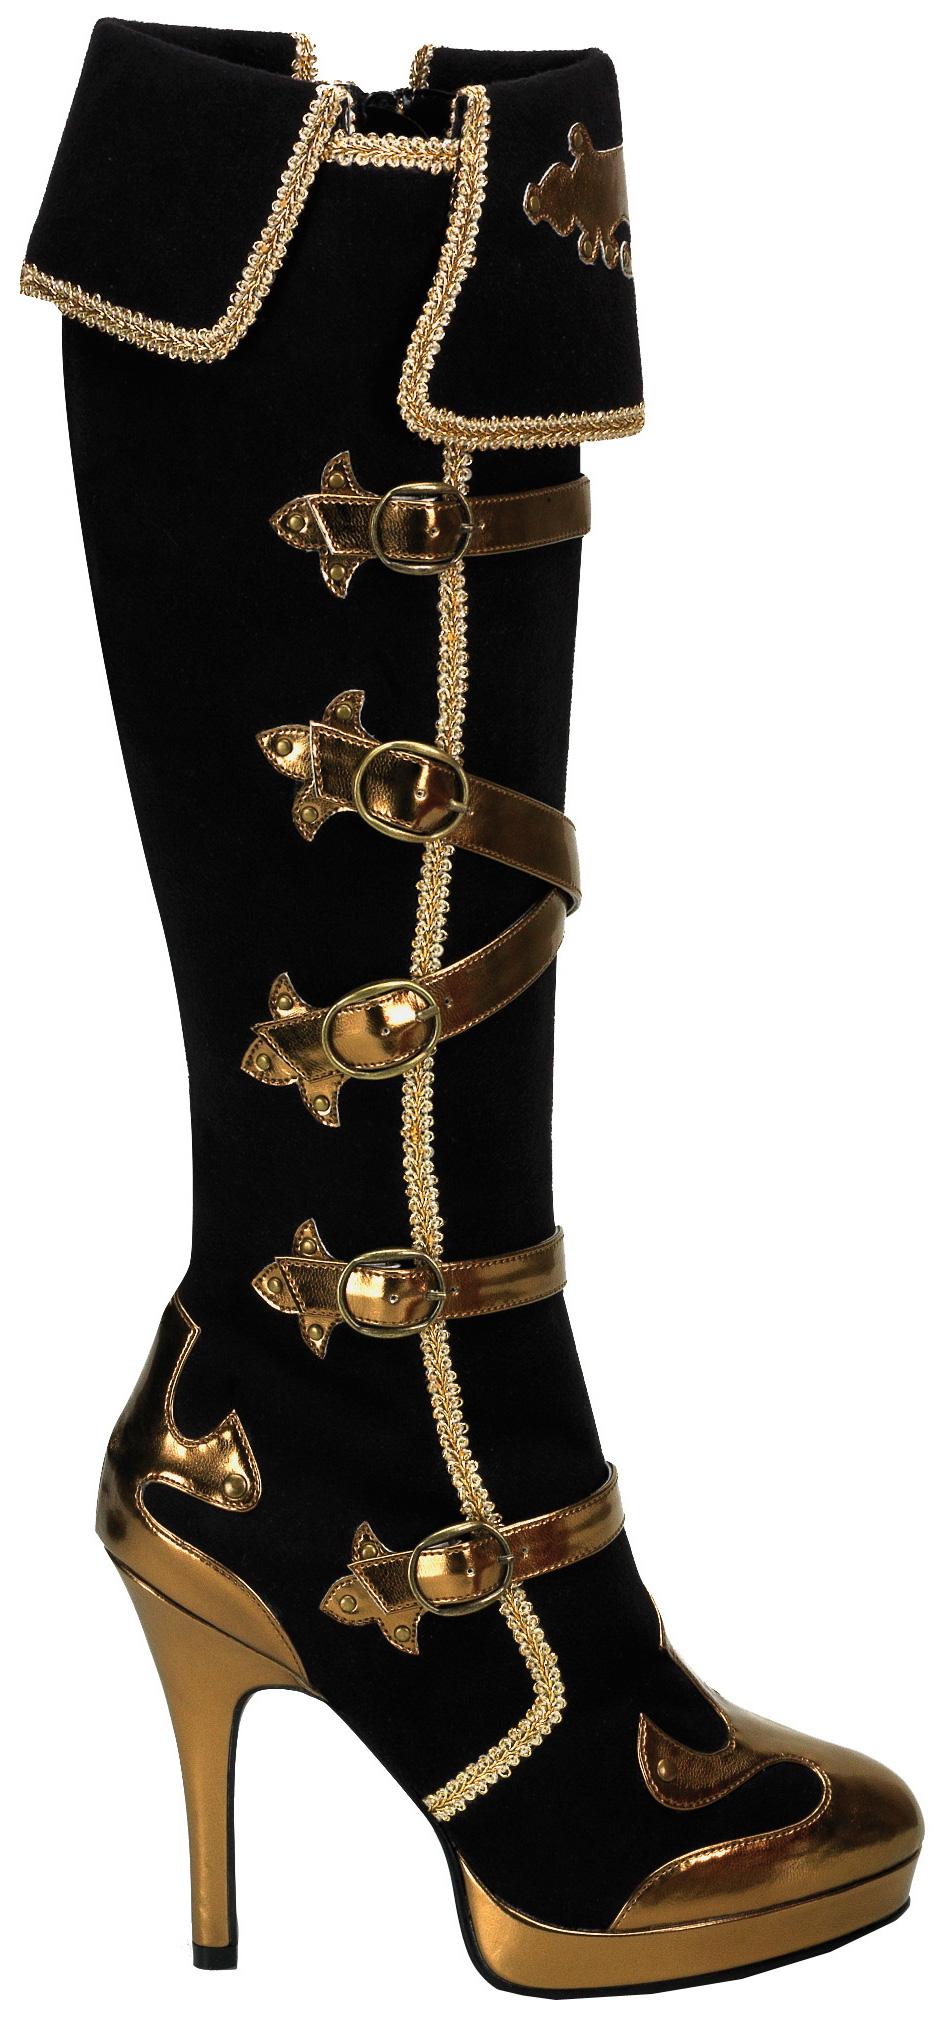 Chaussure Chaussure Femme Pas Pas Steampunk Steampunk Steampunk Cher Cher Cher Femme Chaussure Pas Femme qwR0xC5A